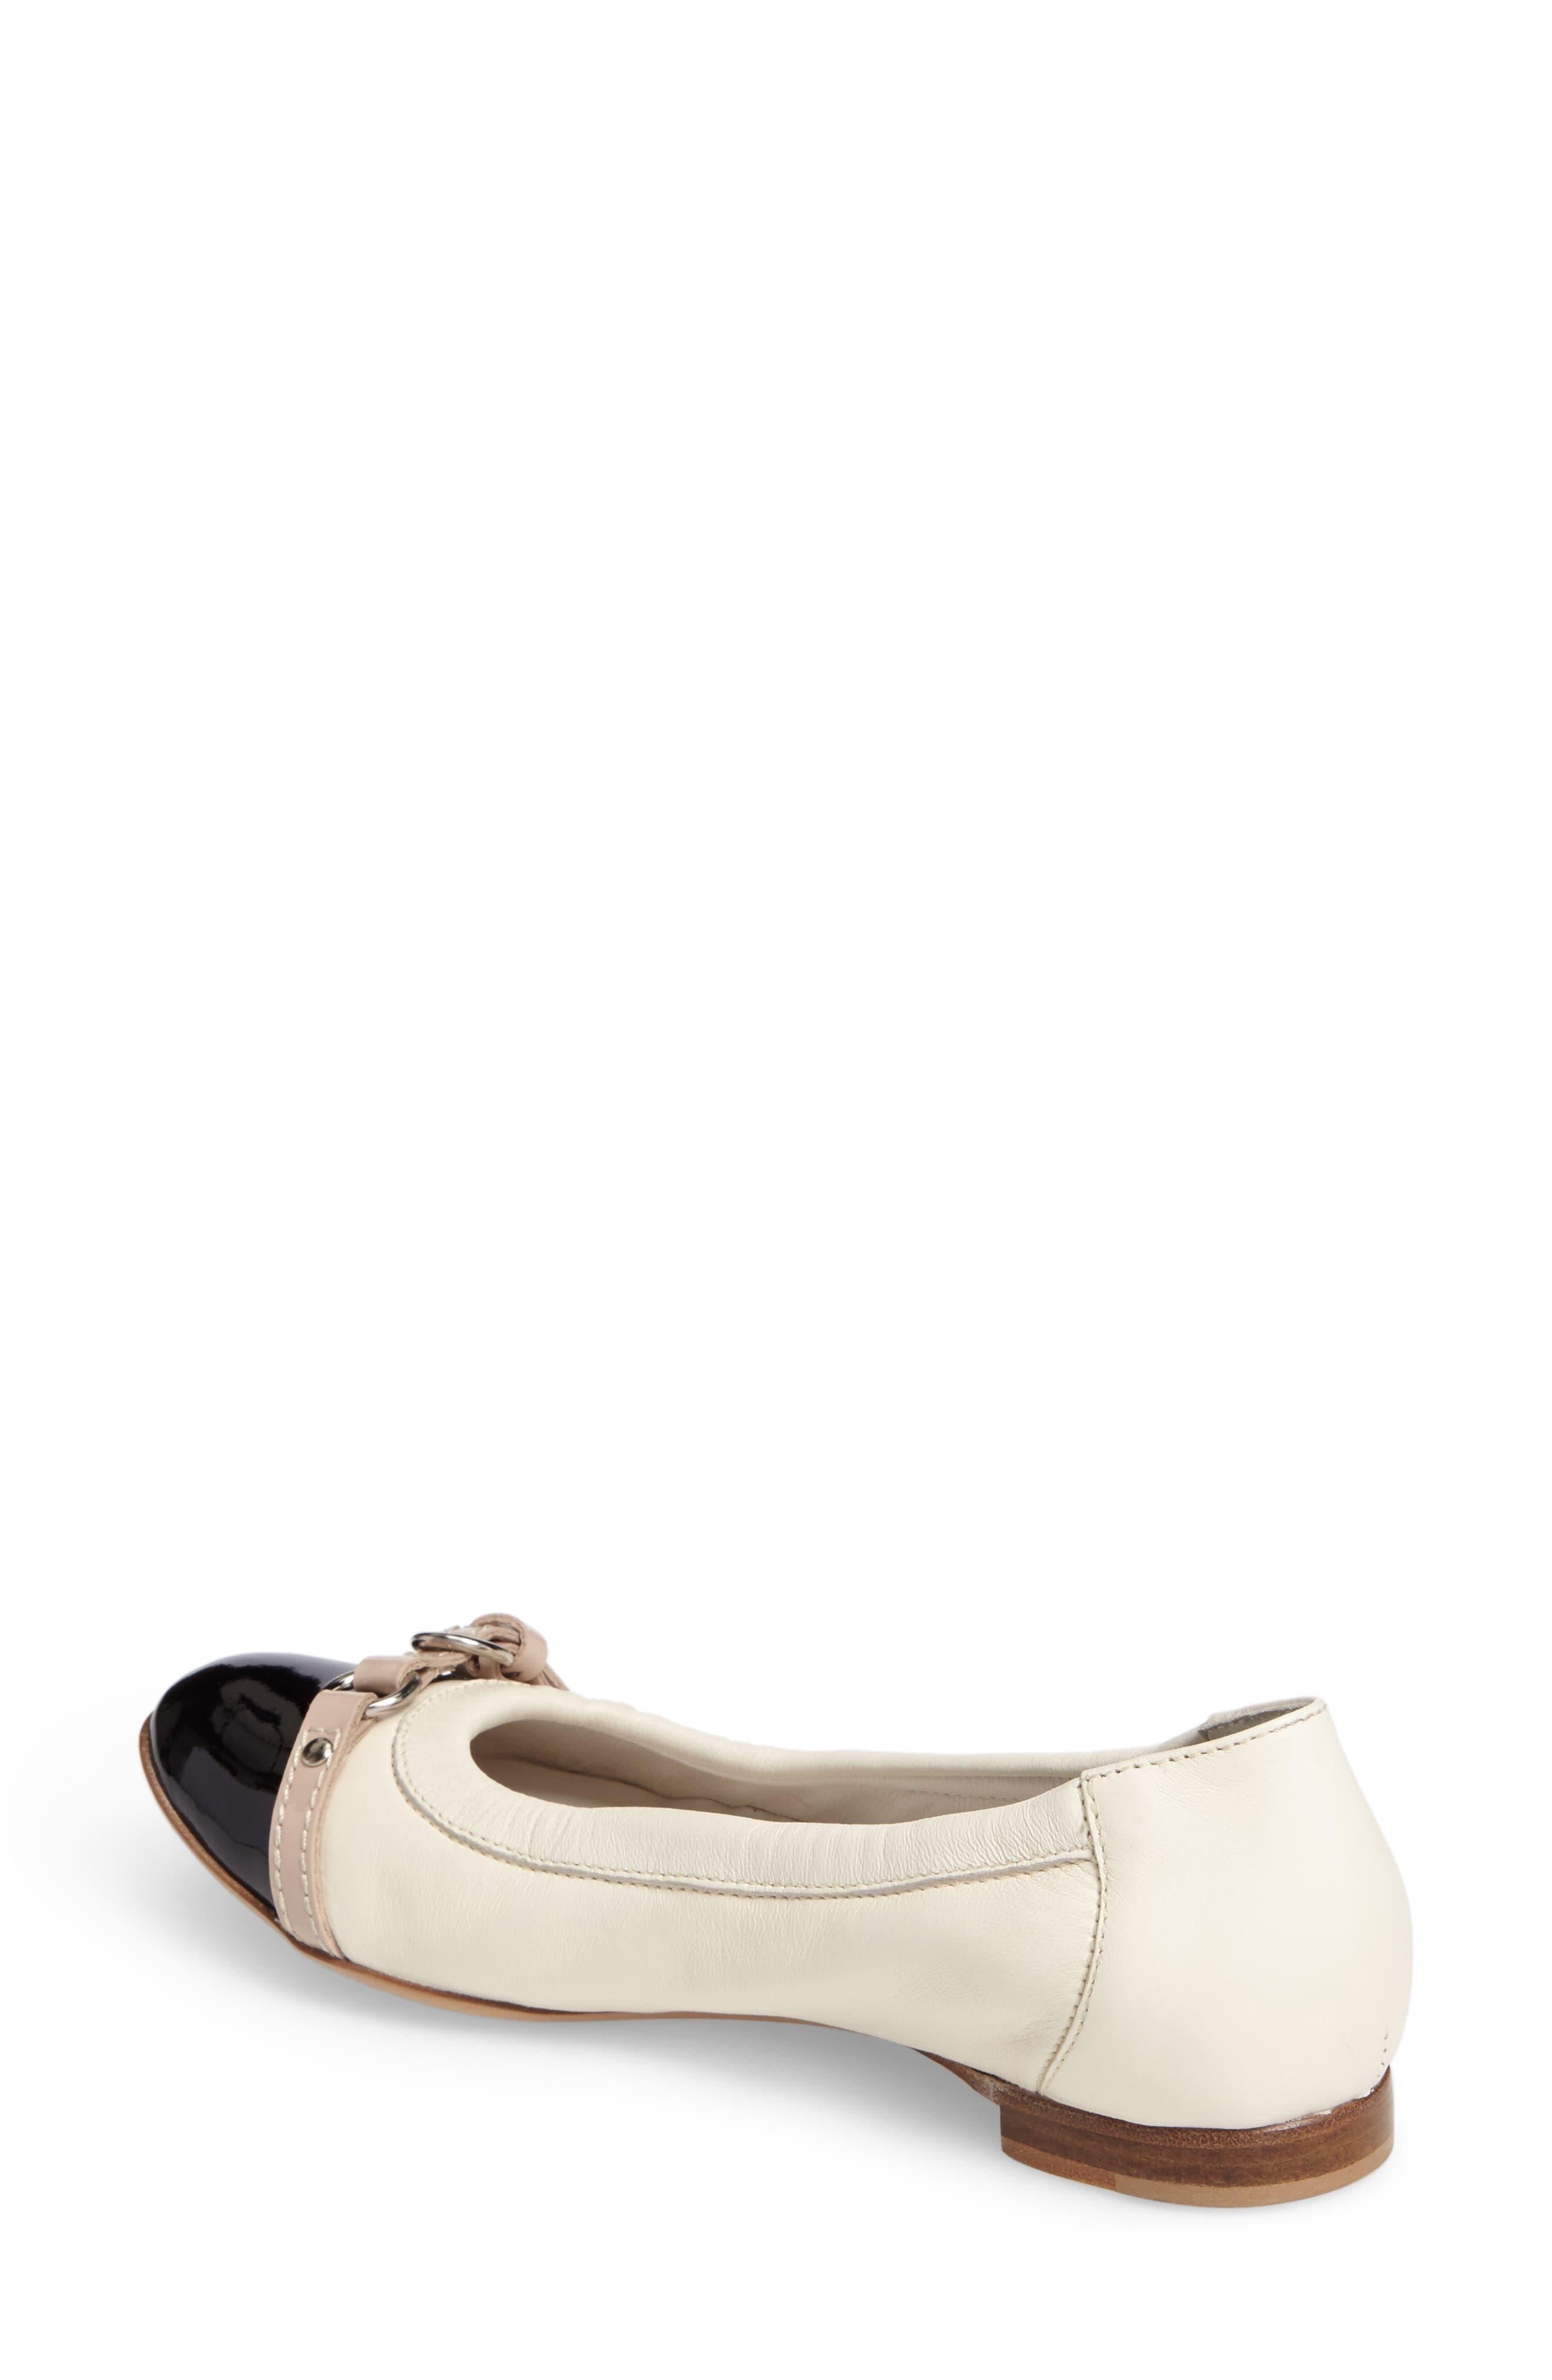 ,                             Cap Toe Ballet Flat,                             Alternate thumbnail 308, color,                             900